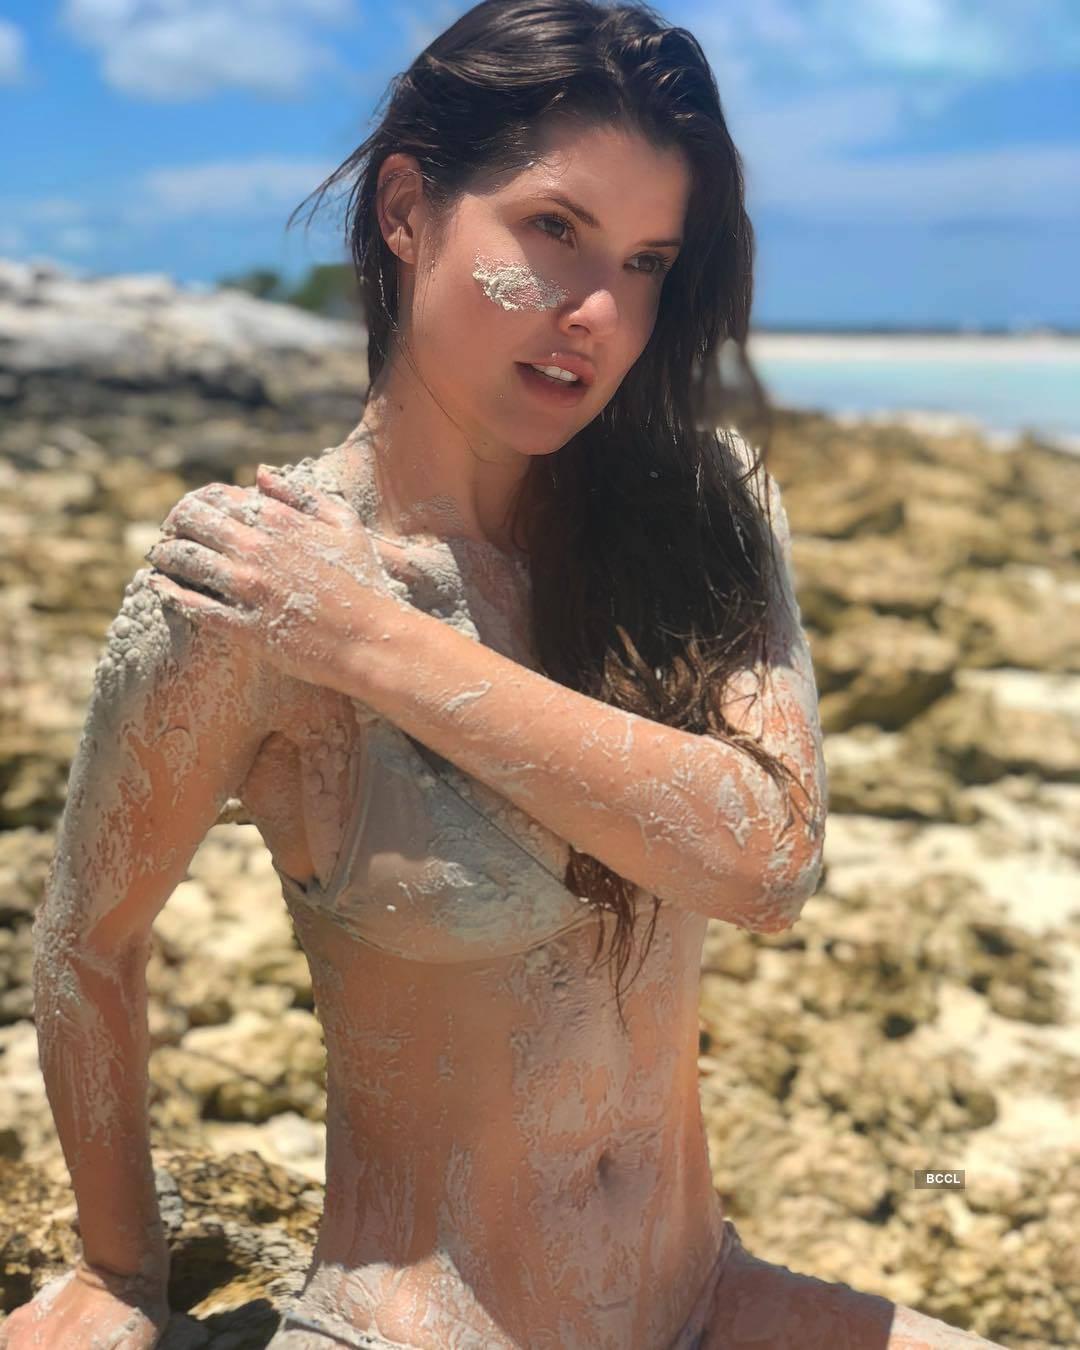 Amanda Cerny, the stunner